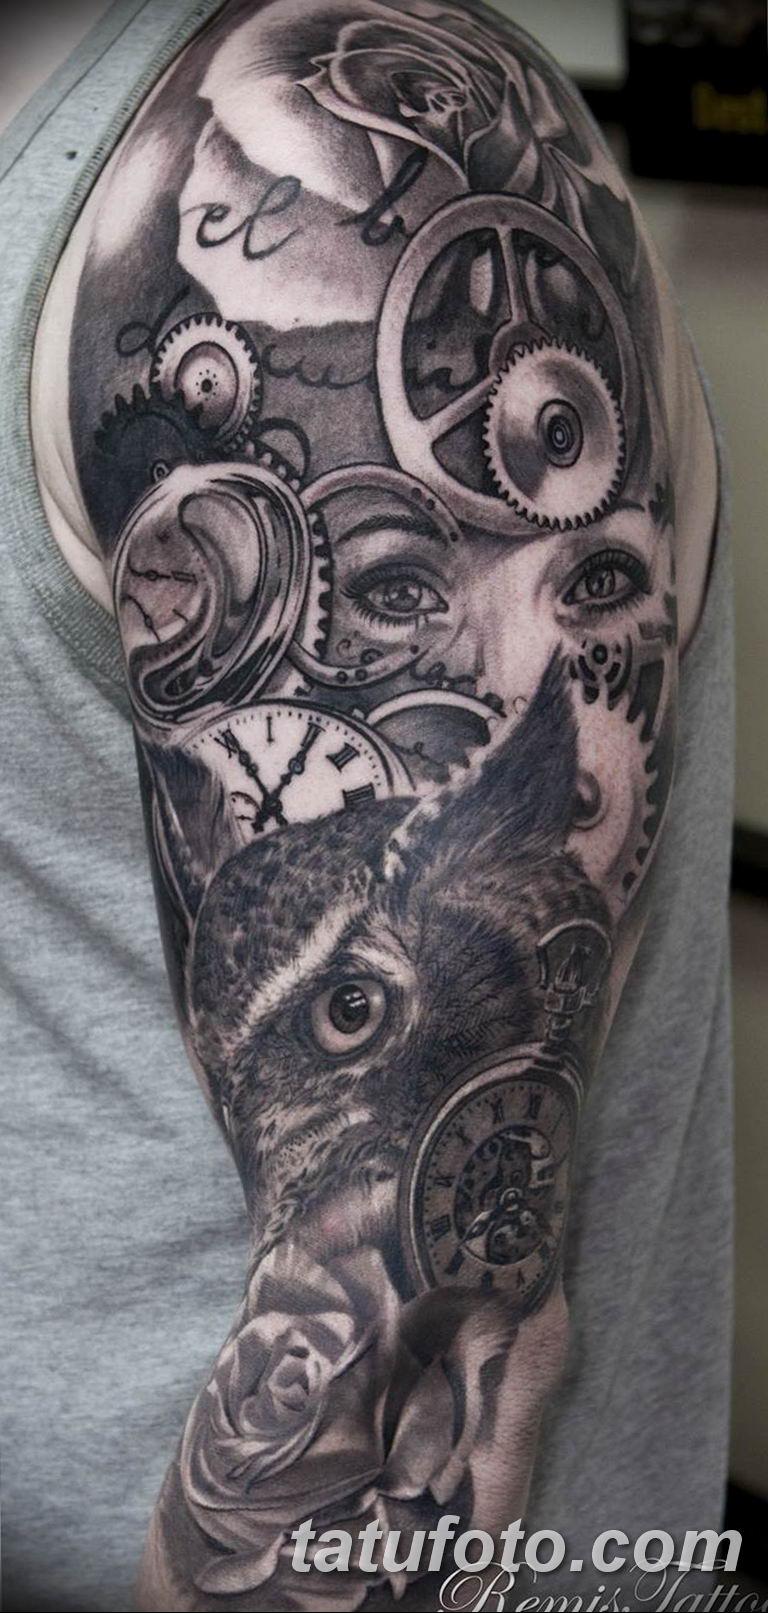 Фото ттату время (часы) 16.04.2019 №508 - tattoo time (hours) - tatufoto.com